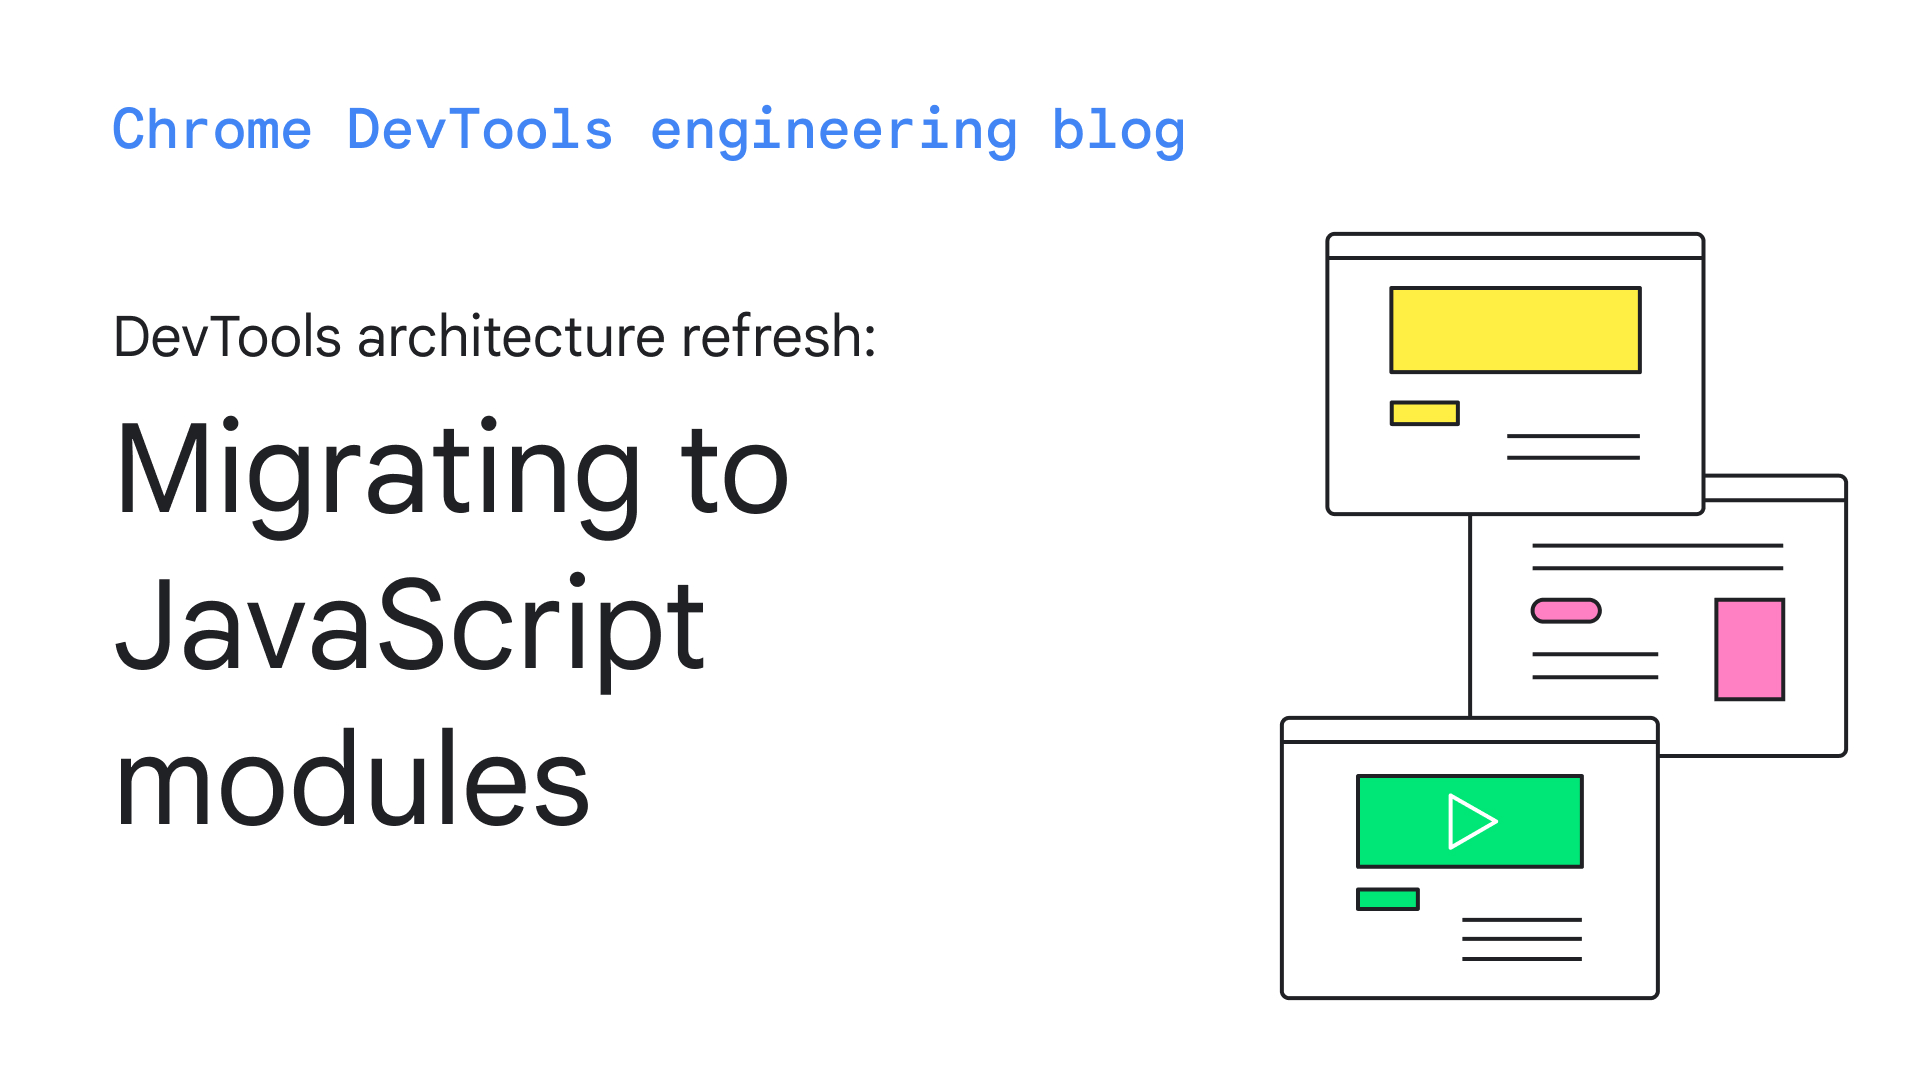 DevTools architecture refresh: migrating to JavaScript modules